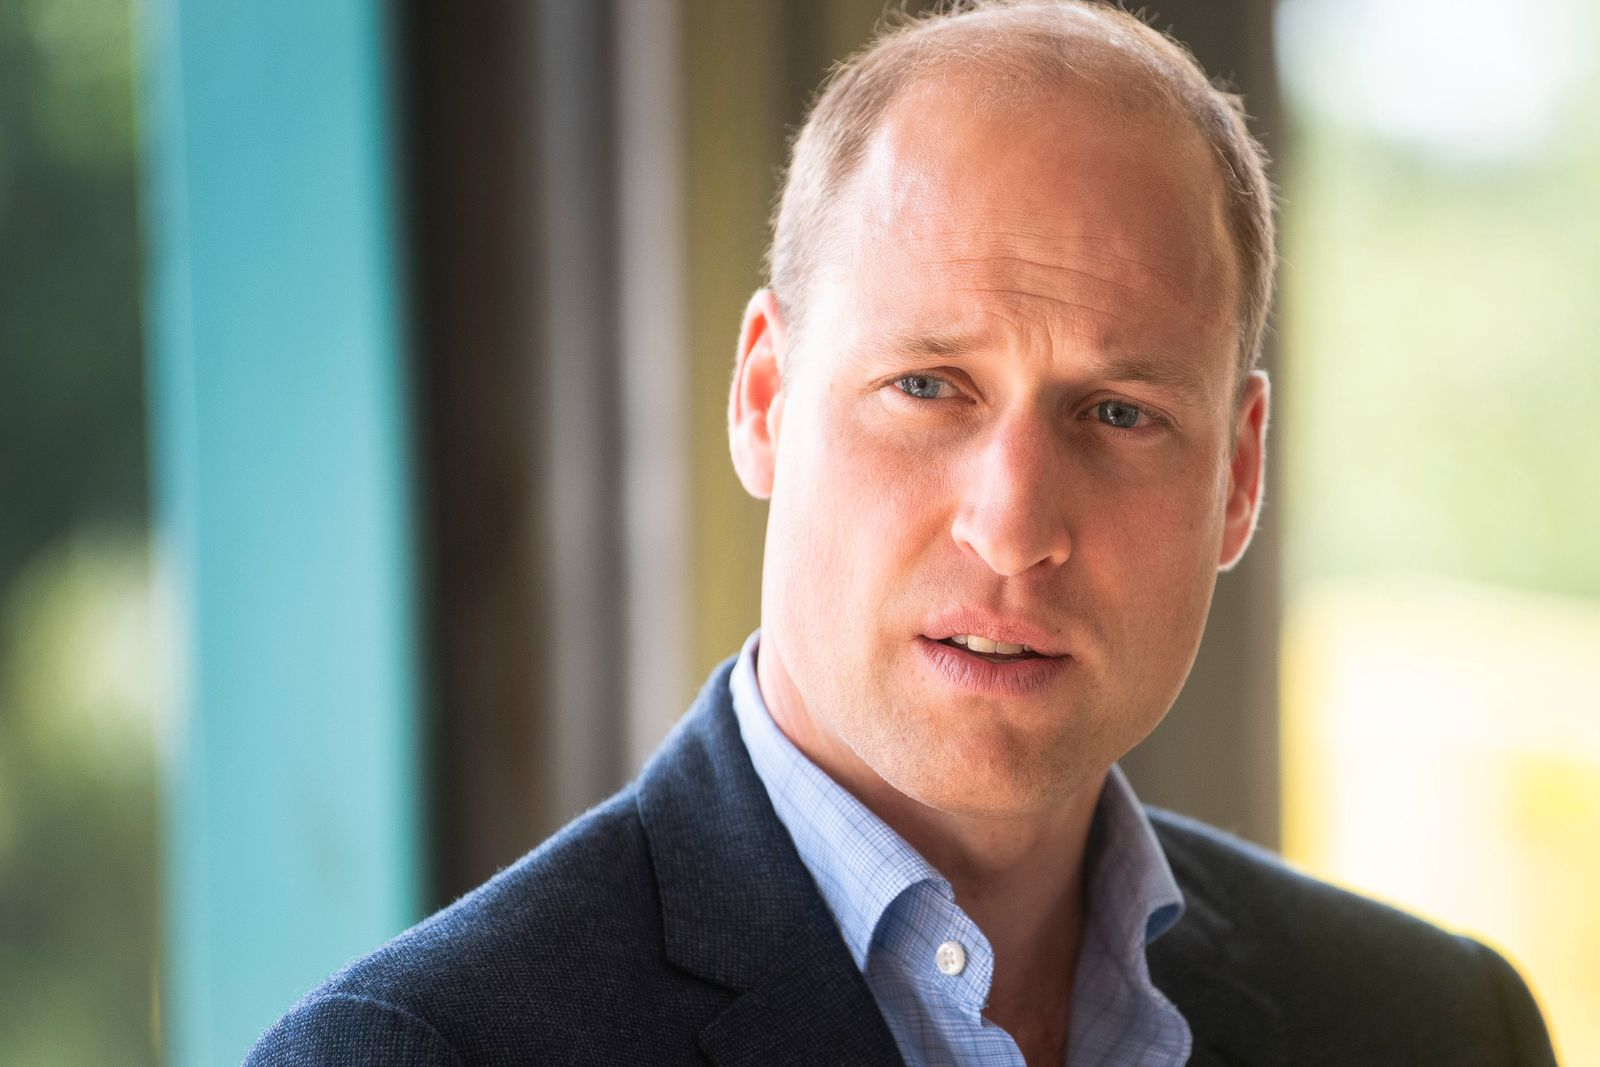 The Duke of Cambridge Visits The Kings Lynn Ambulance Station